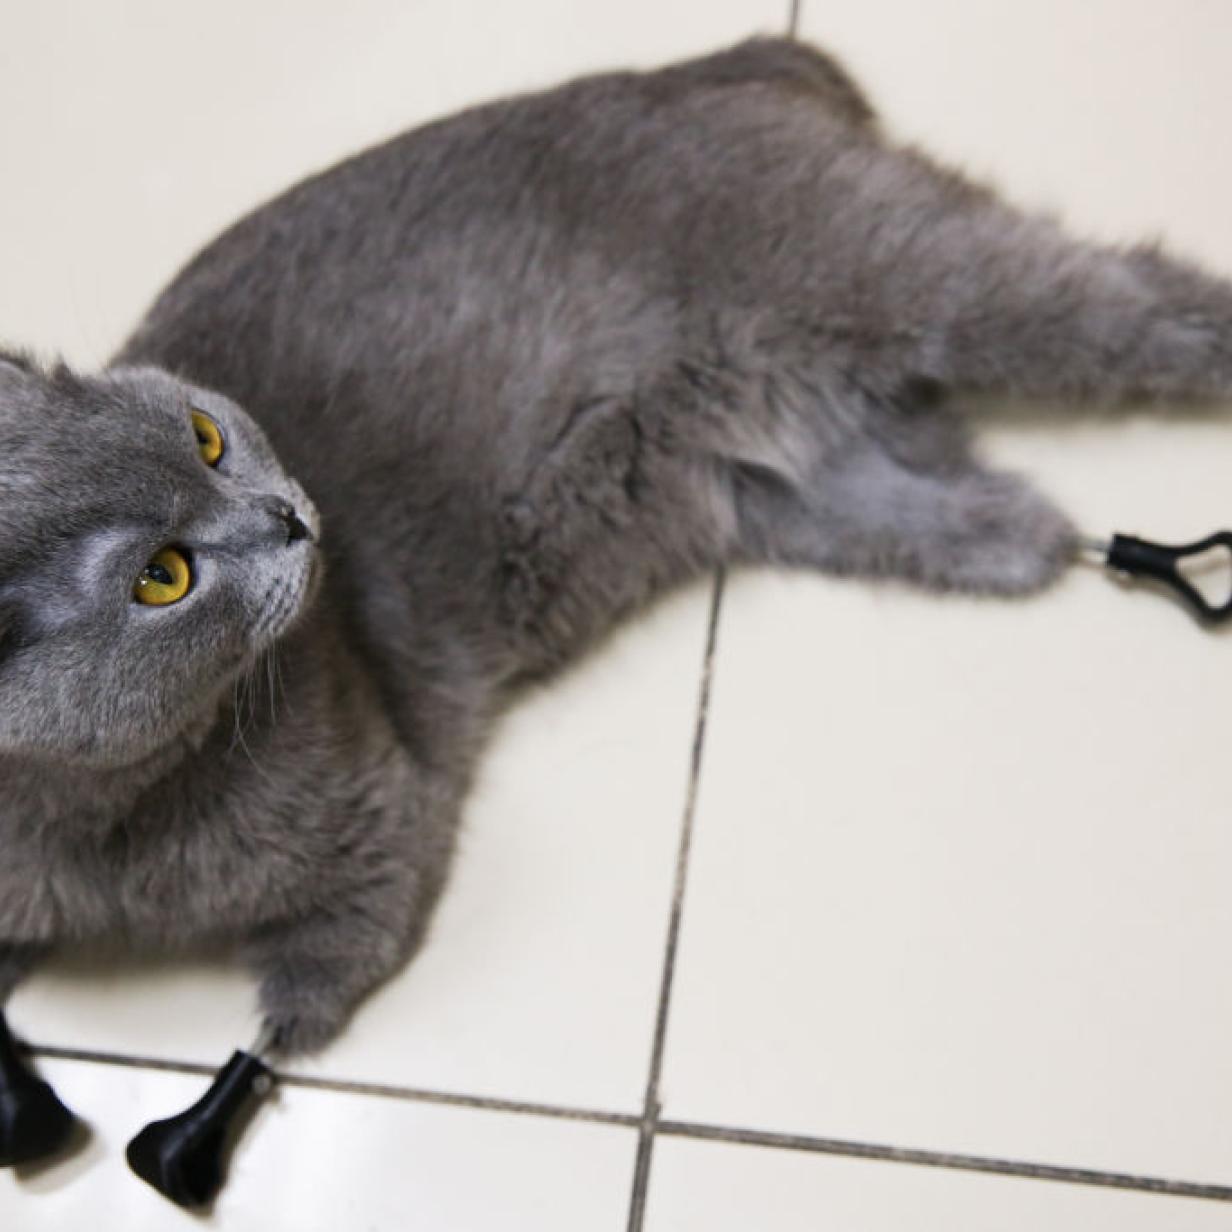 Erfrierungen: Katze Dymka dank Prothesen aus dem 3D-Drucker gerettet